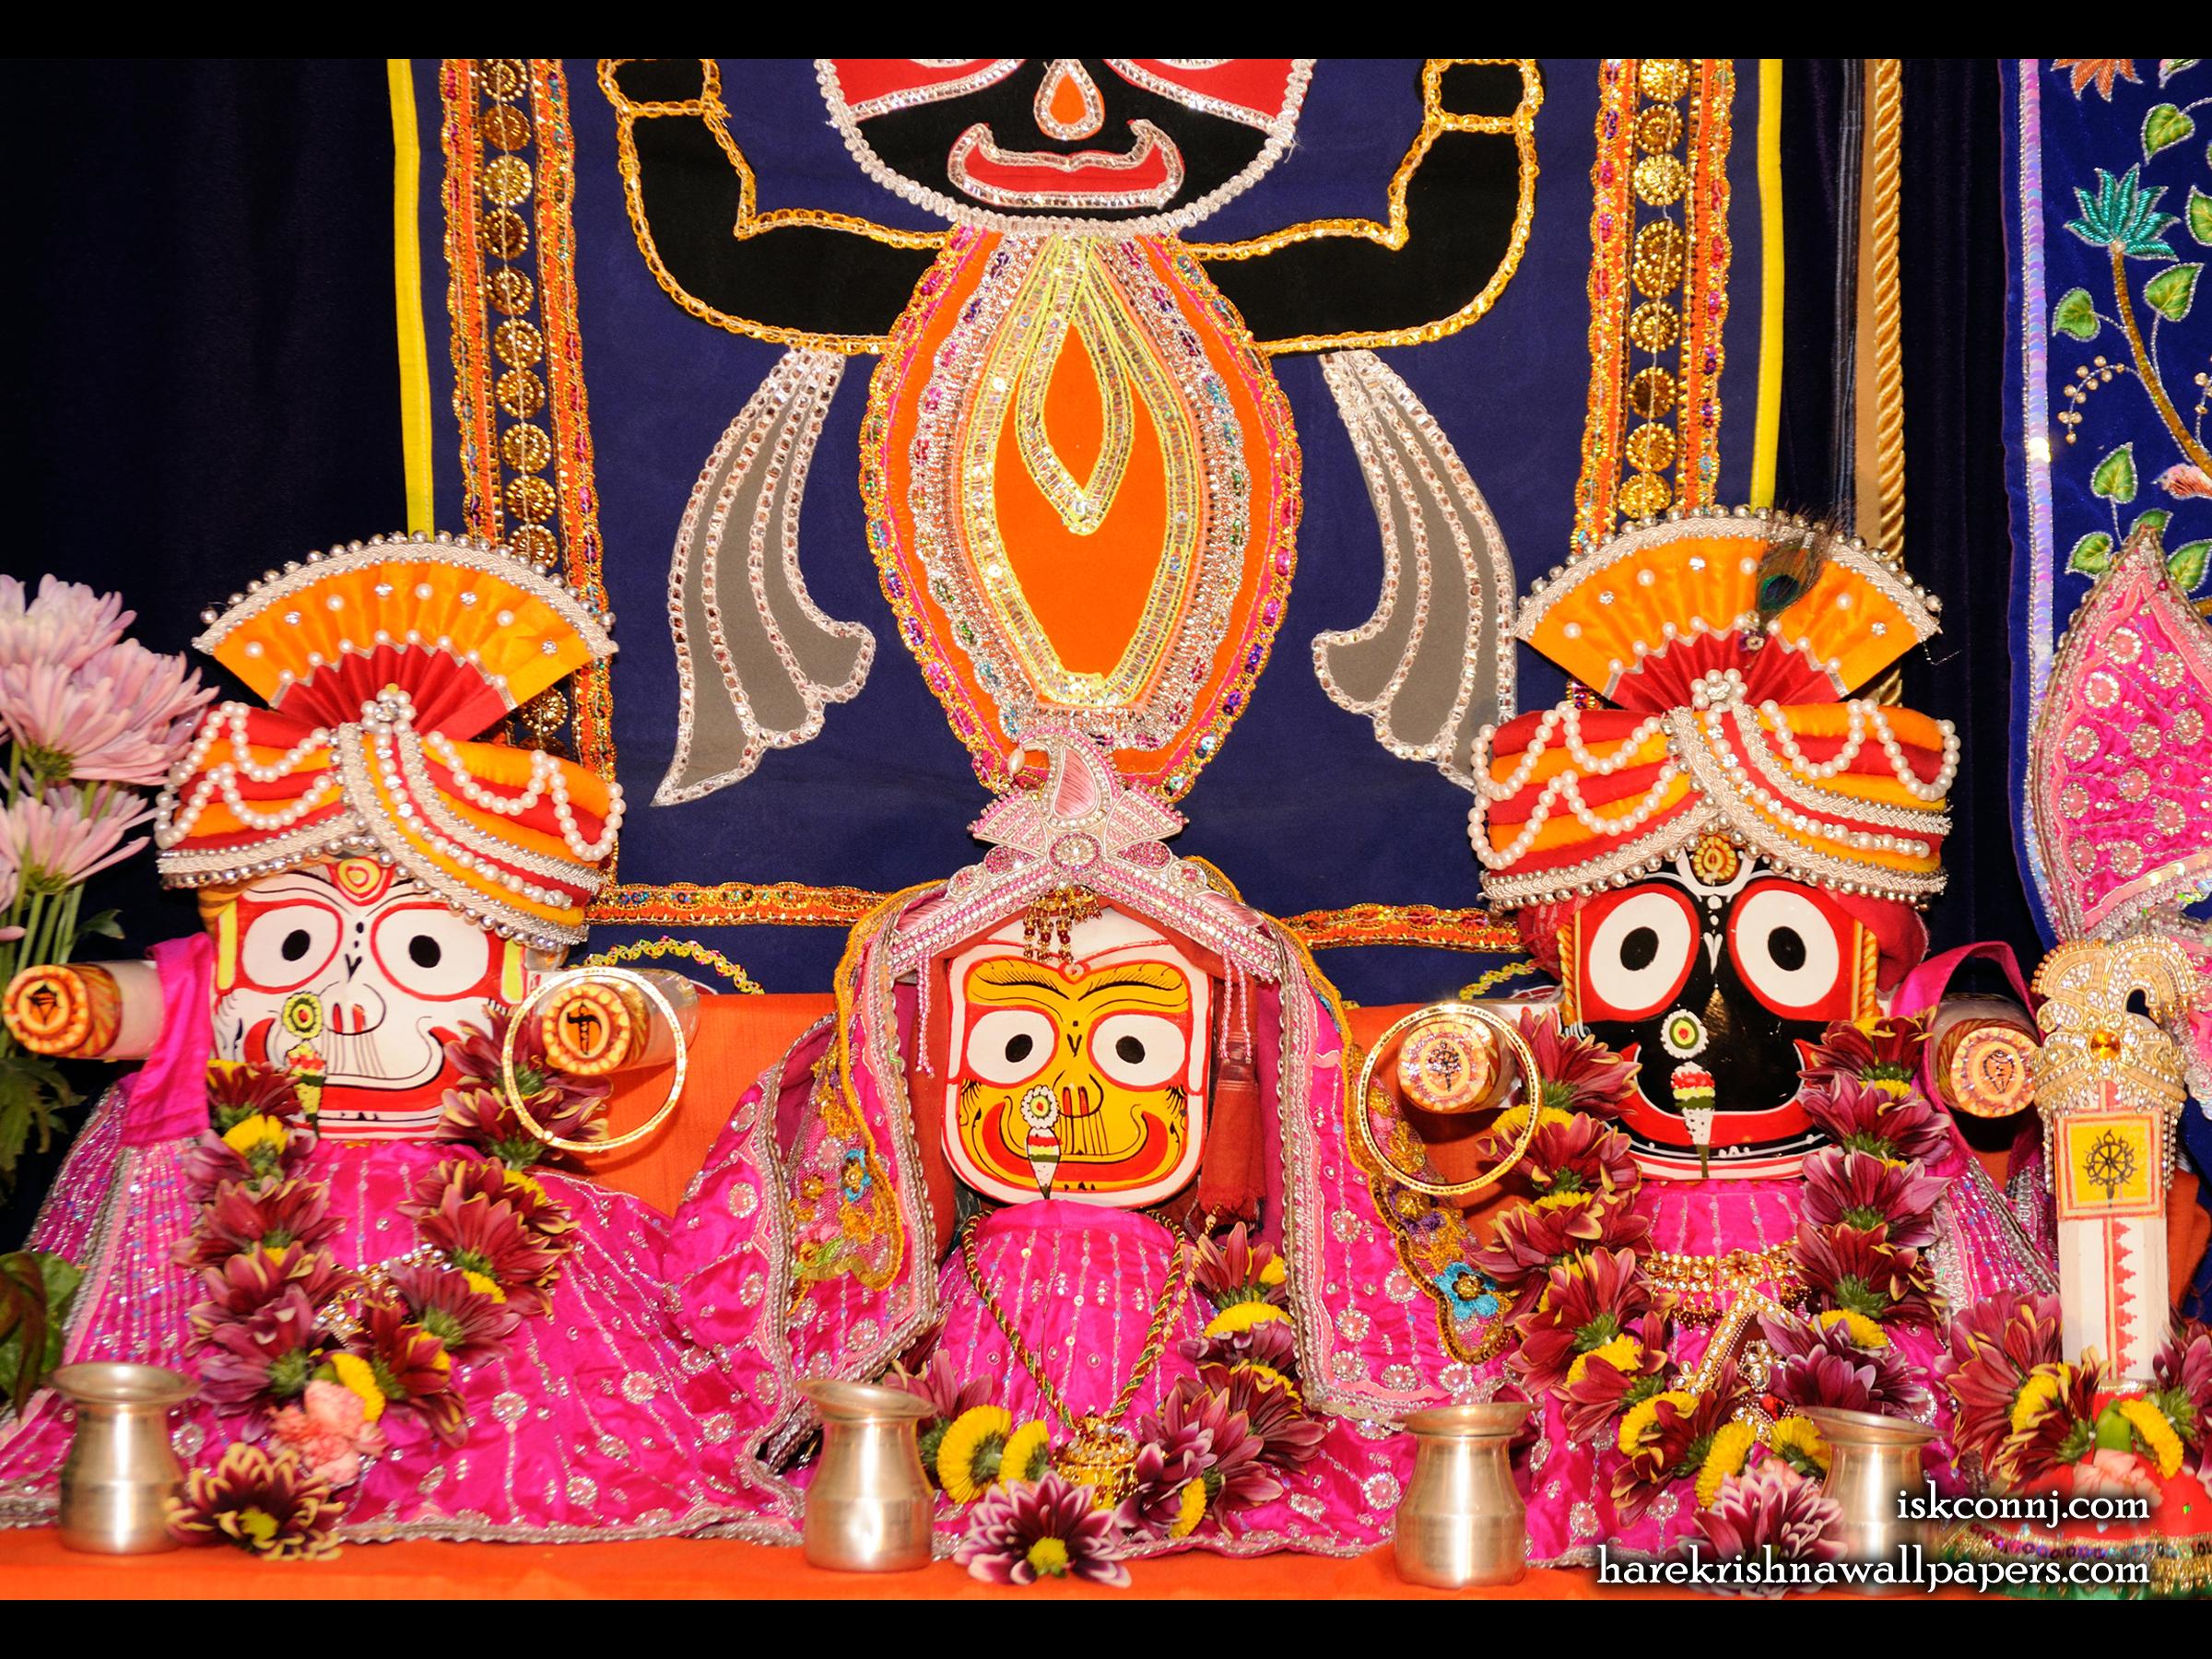 Jagannath Baladeva Subhadra Wallpaper (007) Size 2400x1800 Download